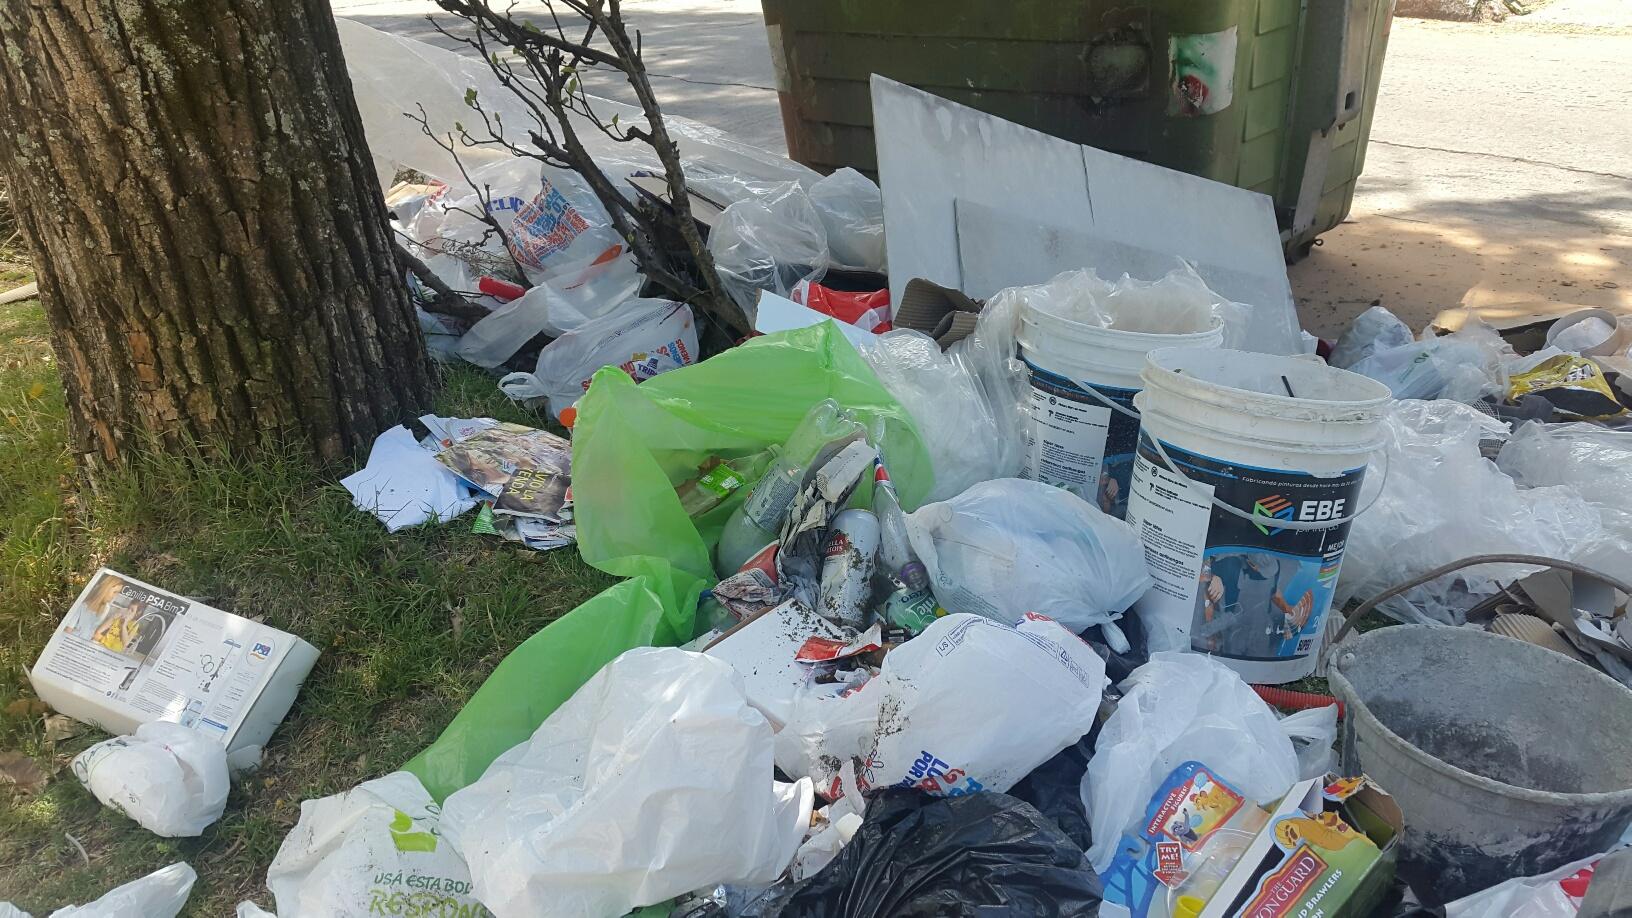 Recolección de residuos en fin de año, ¿qué pasa?